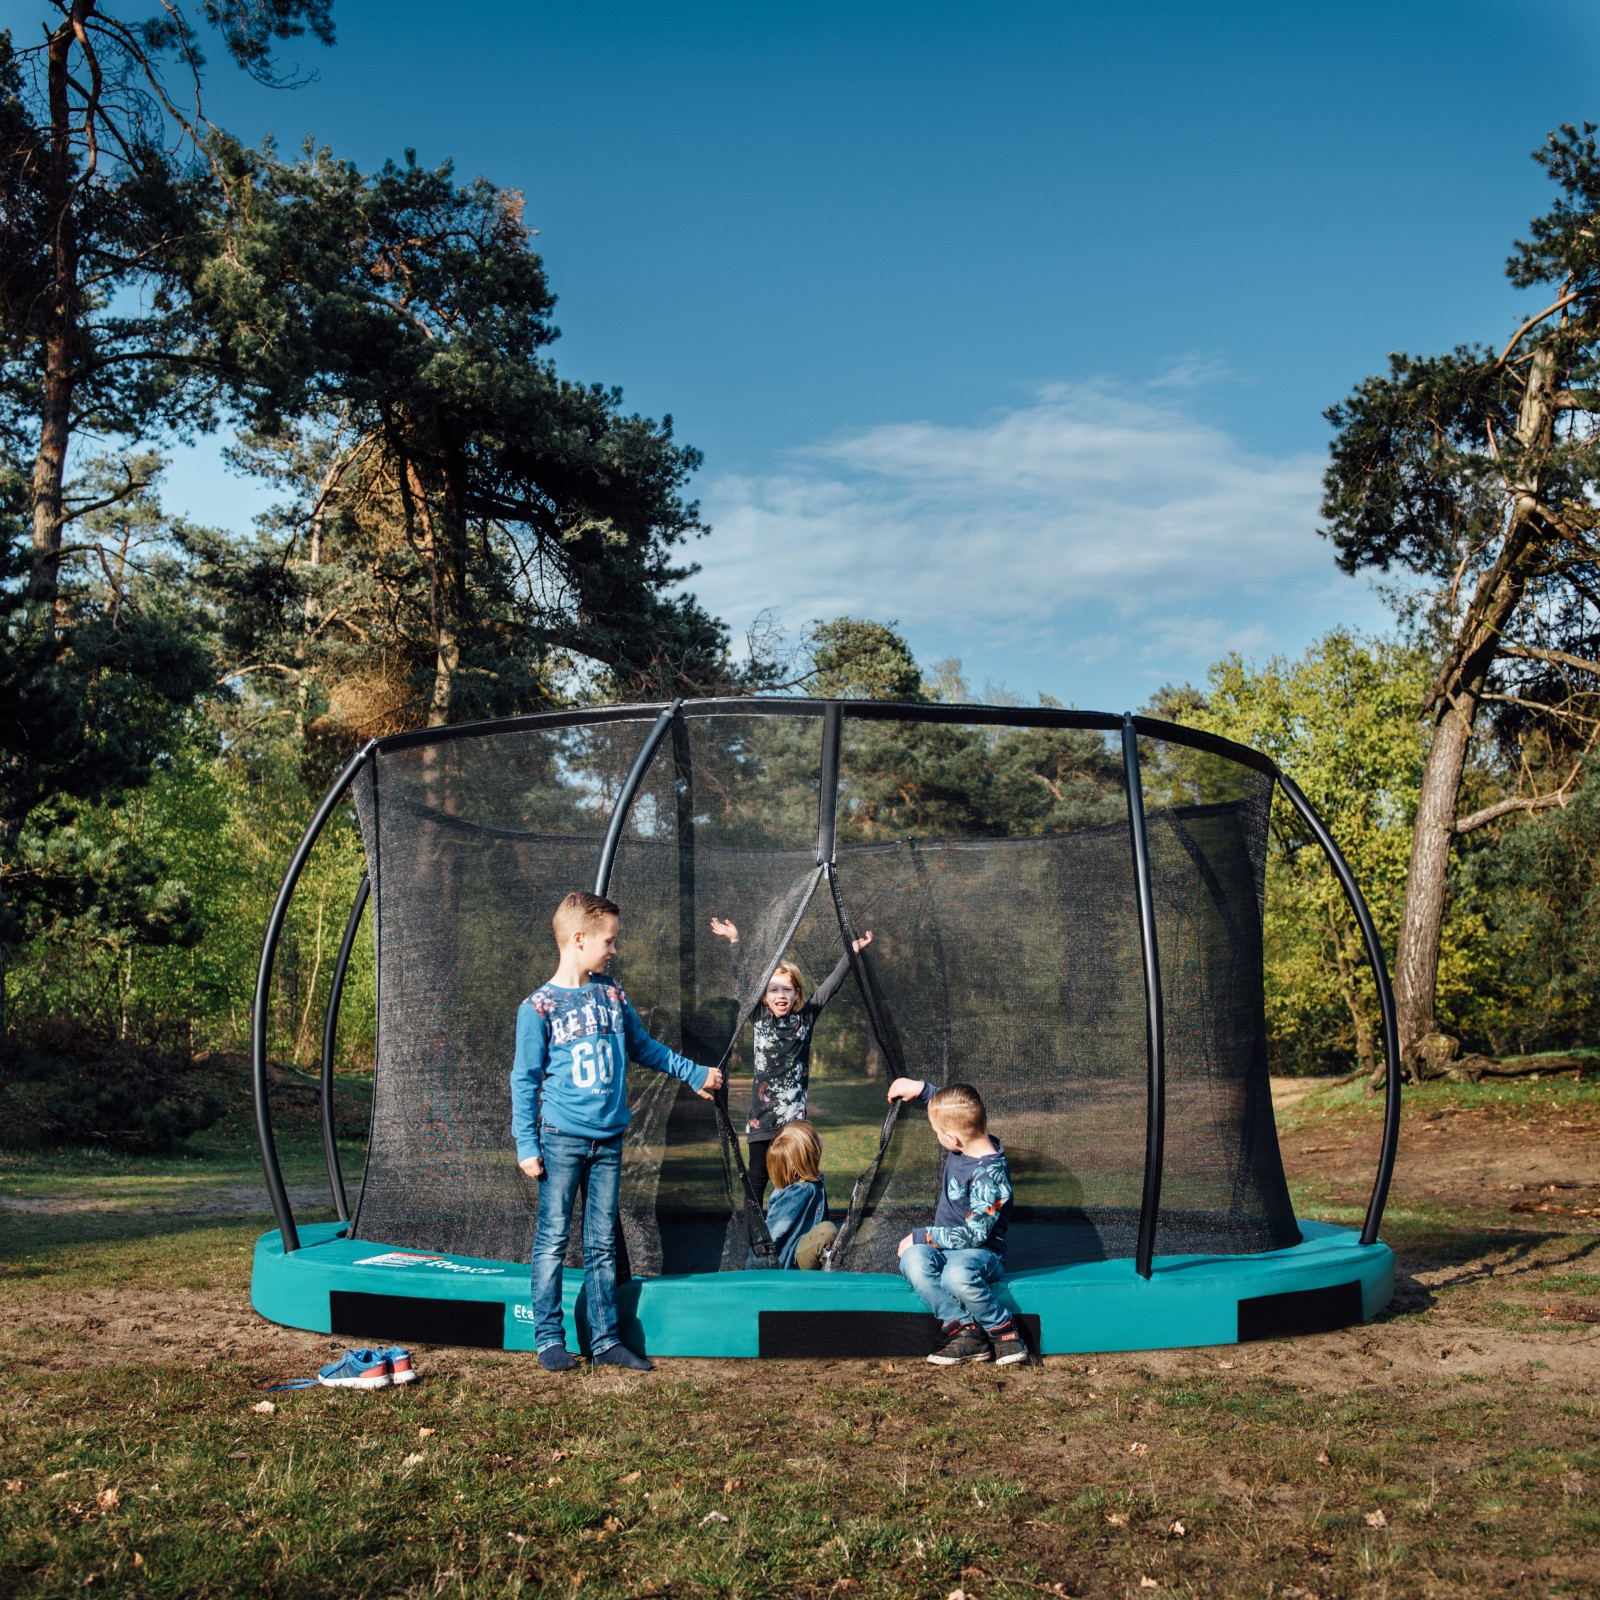 Etan Hi-Flyer Trampoline Inground Set Best Buy At